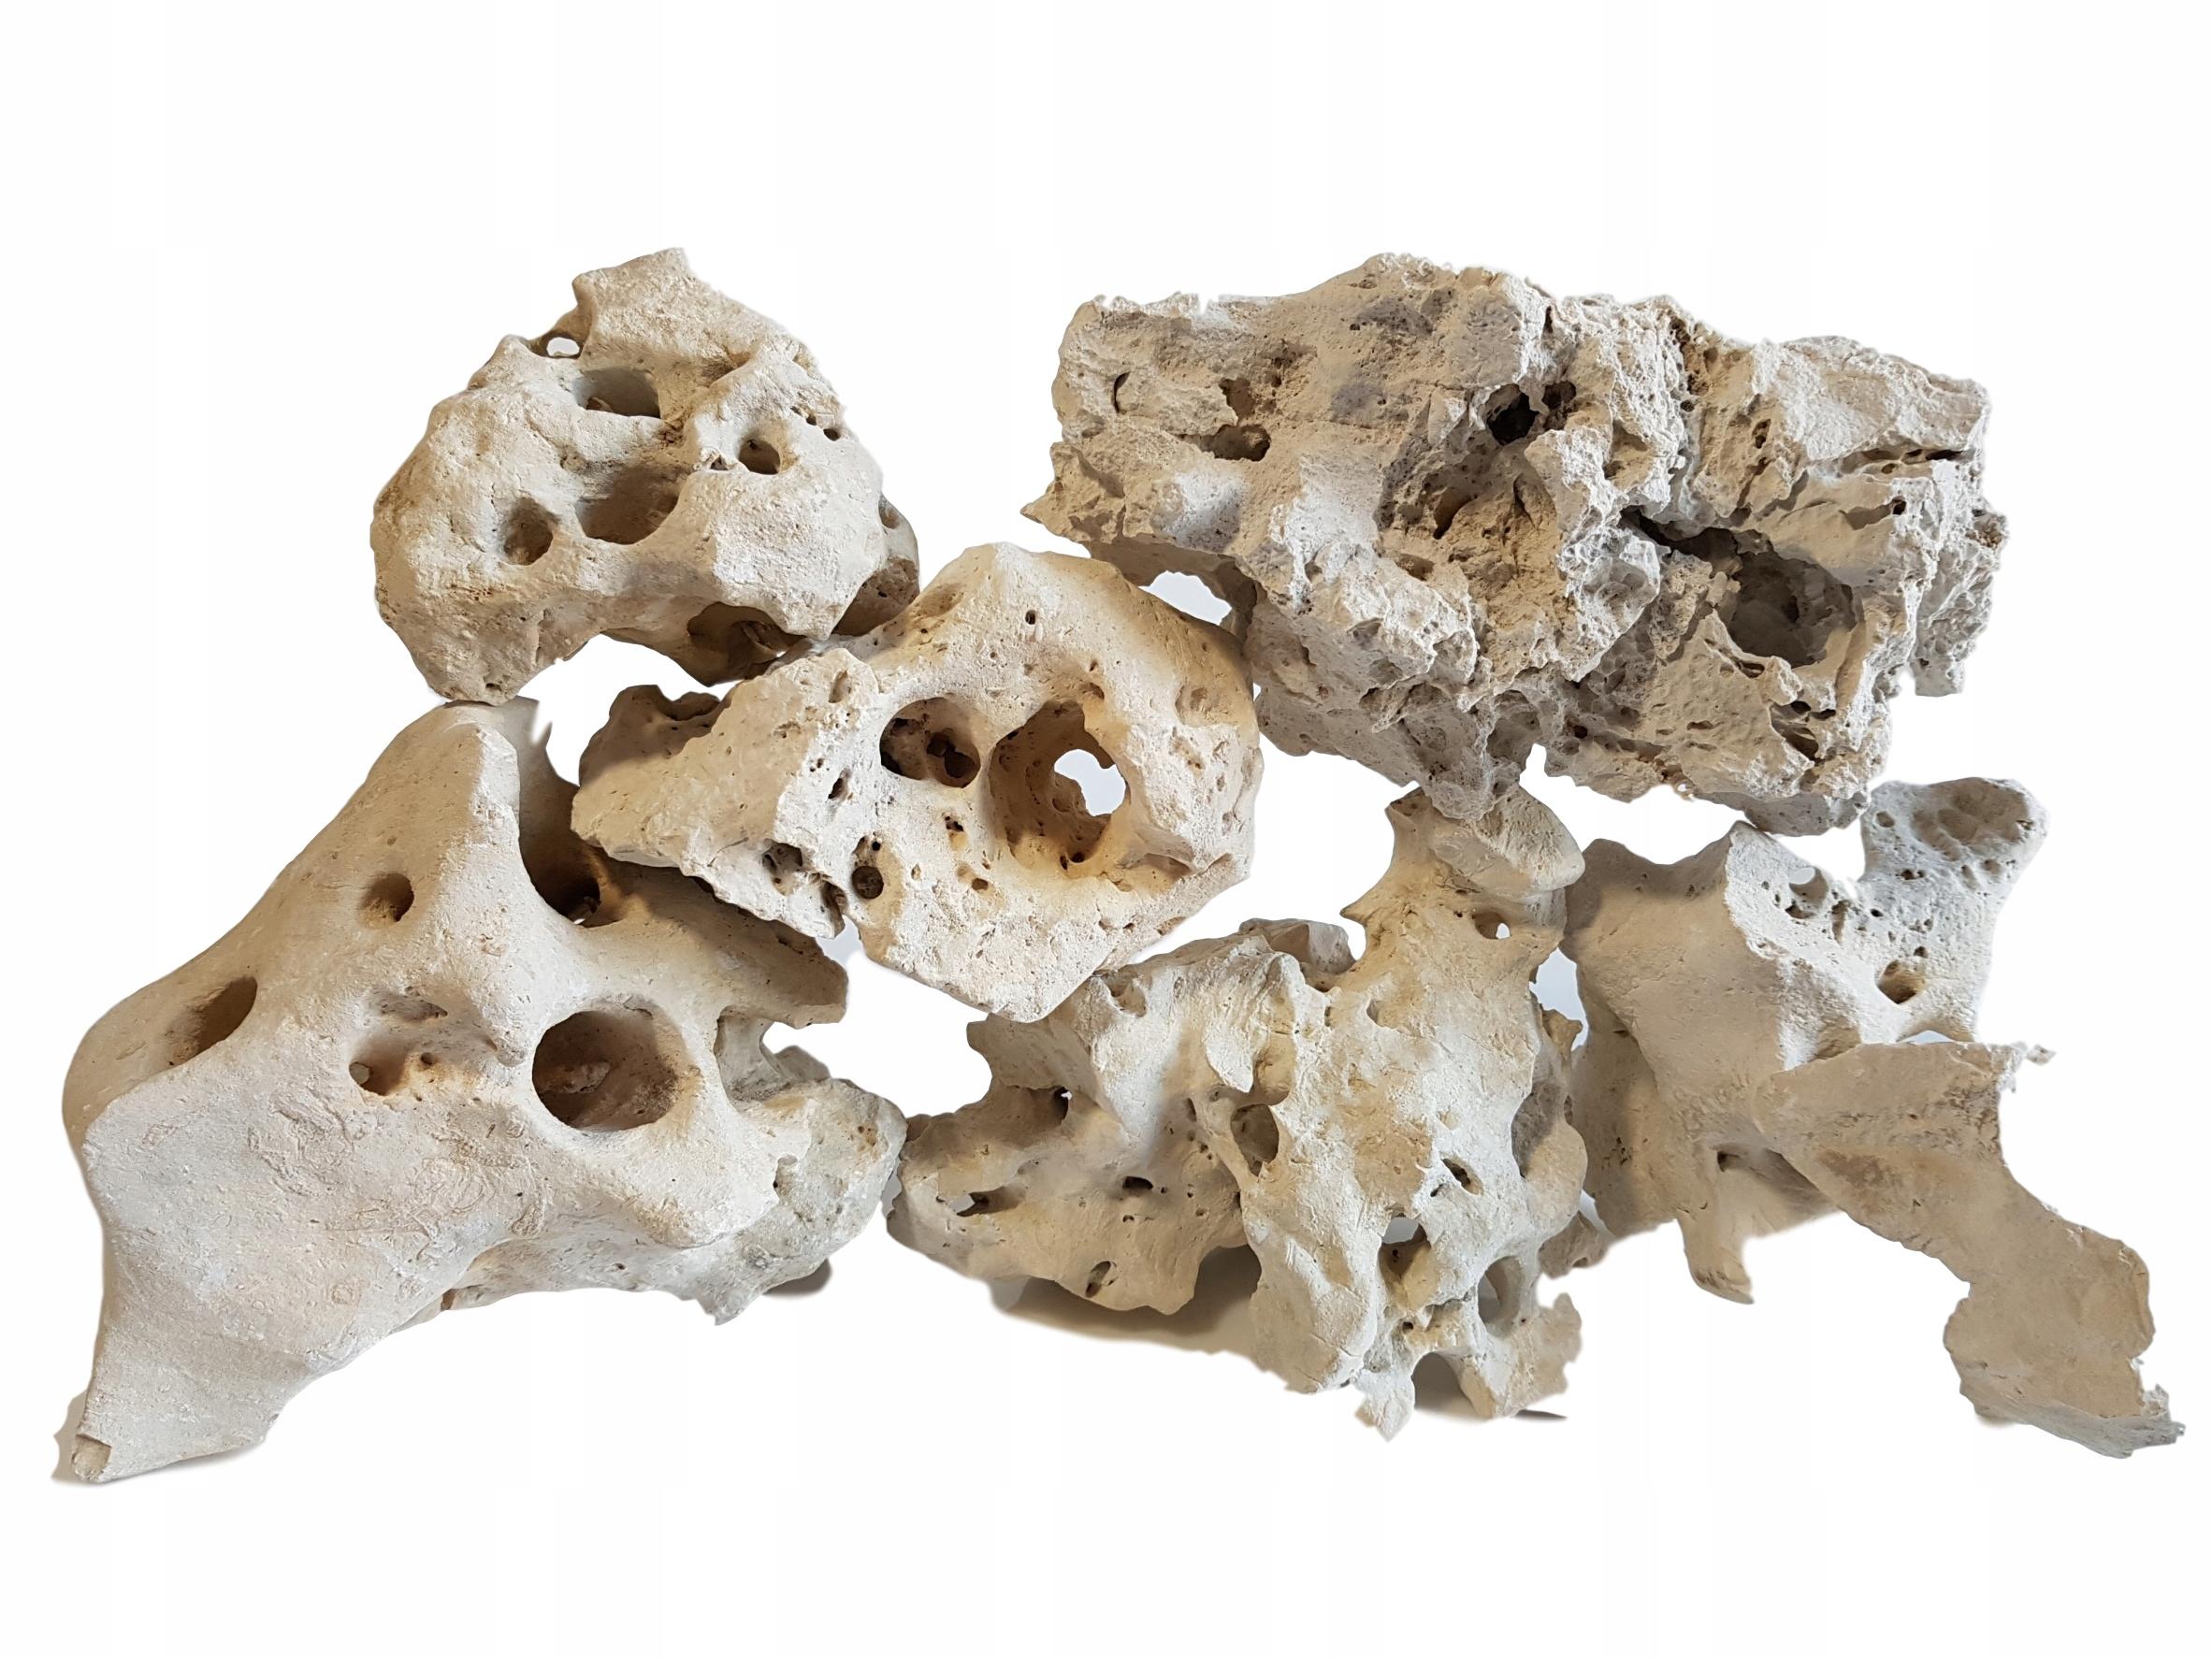 ROCK Kameň Vápenec Filipínske Akvárium 60 KG